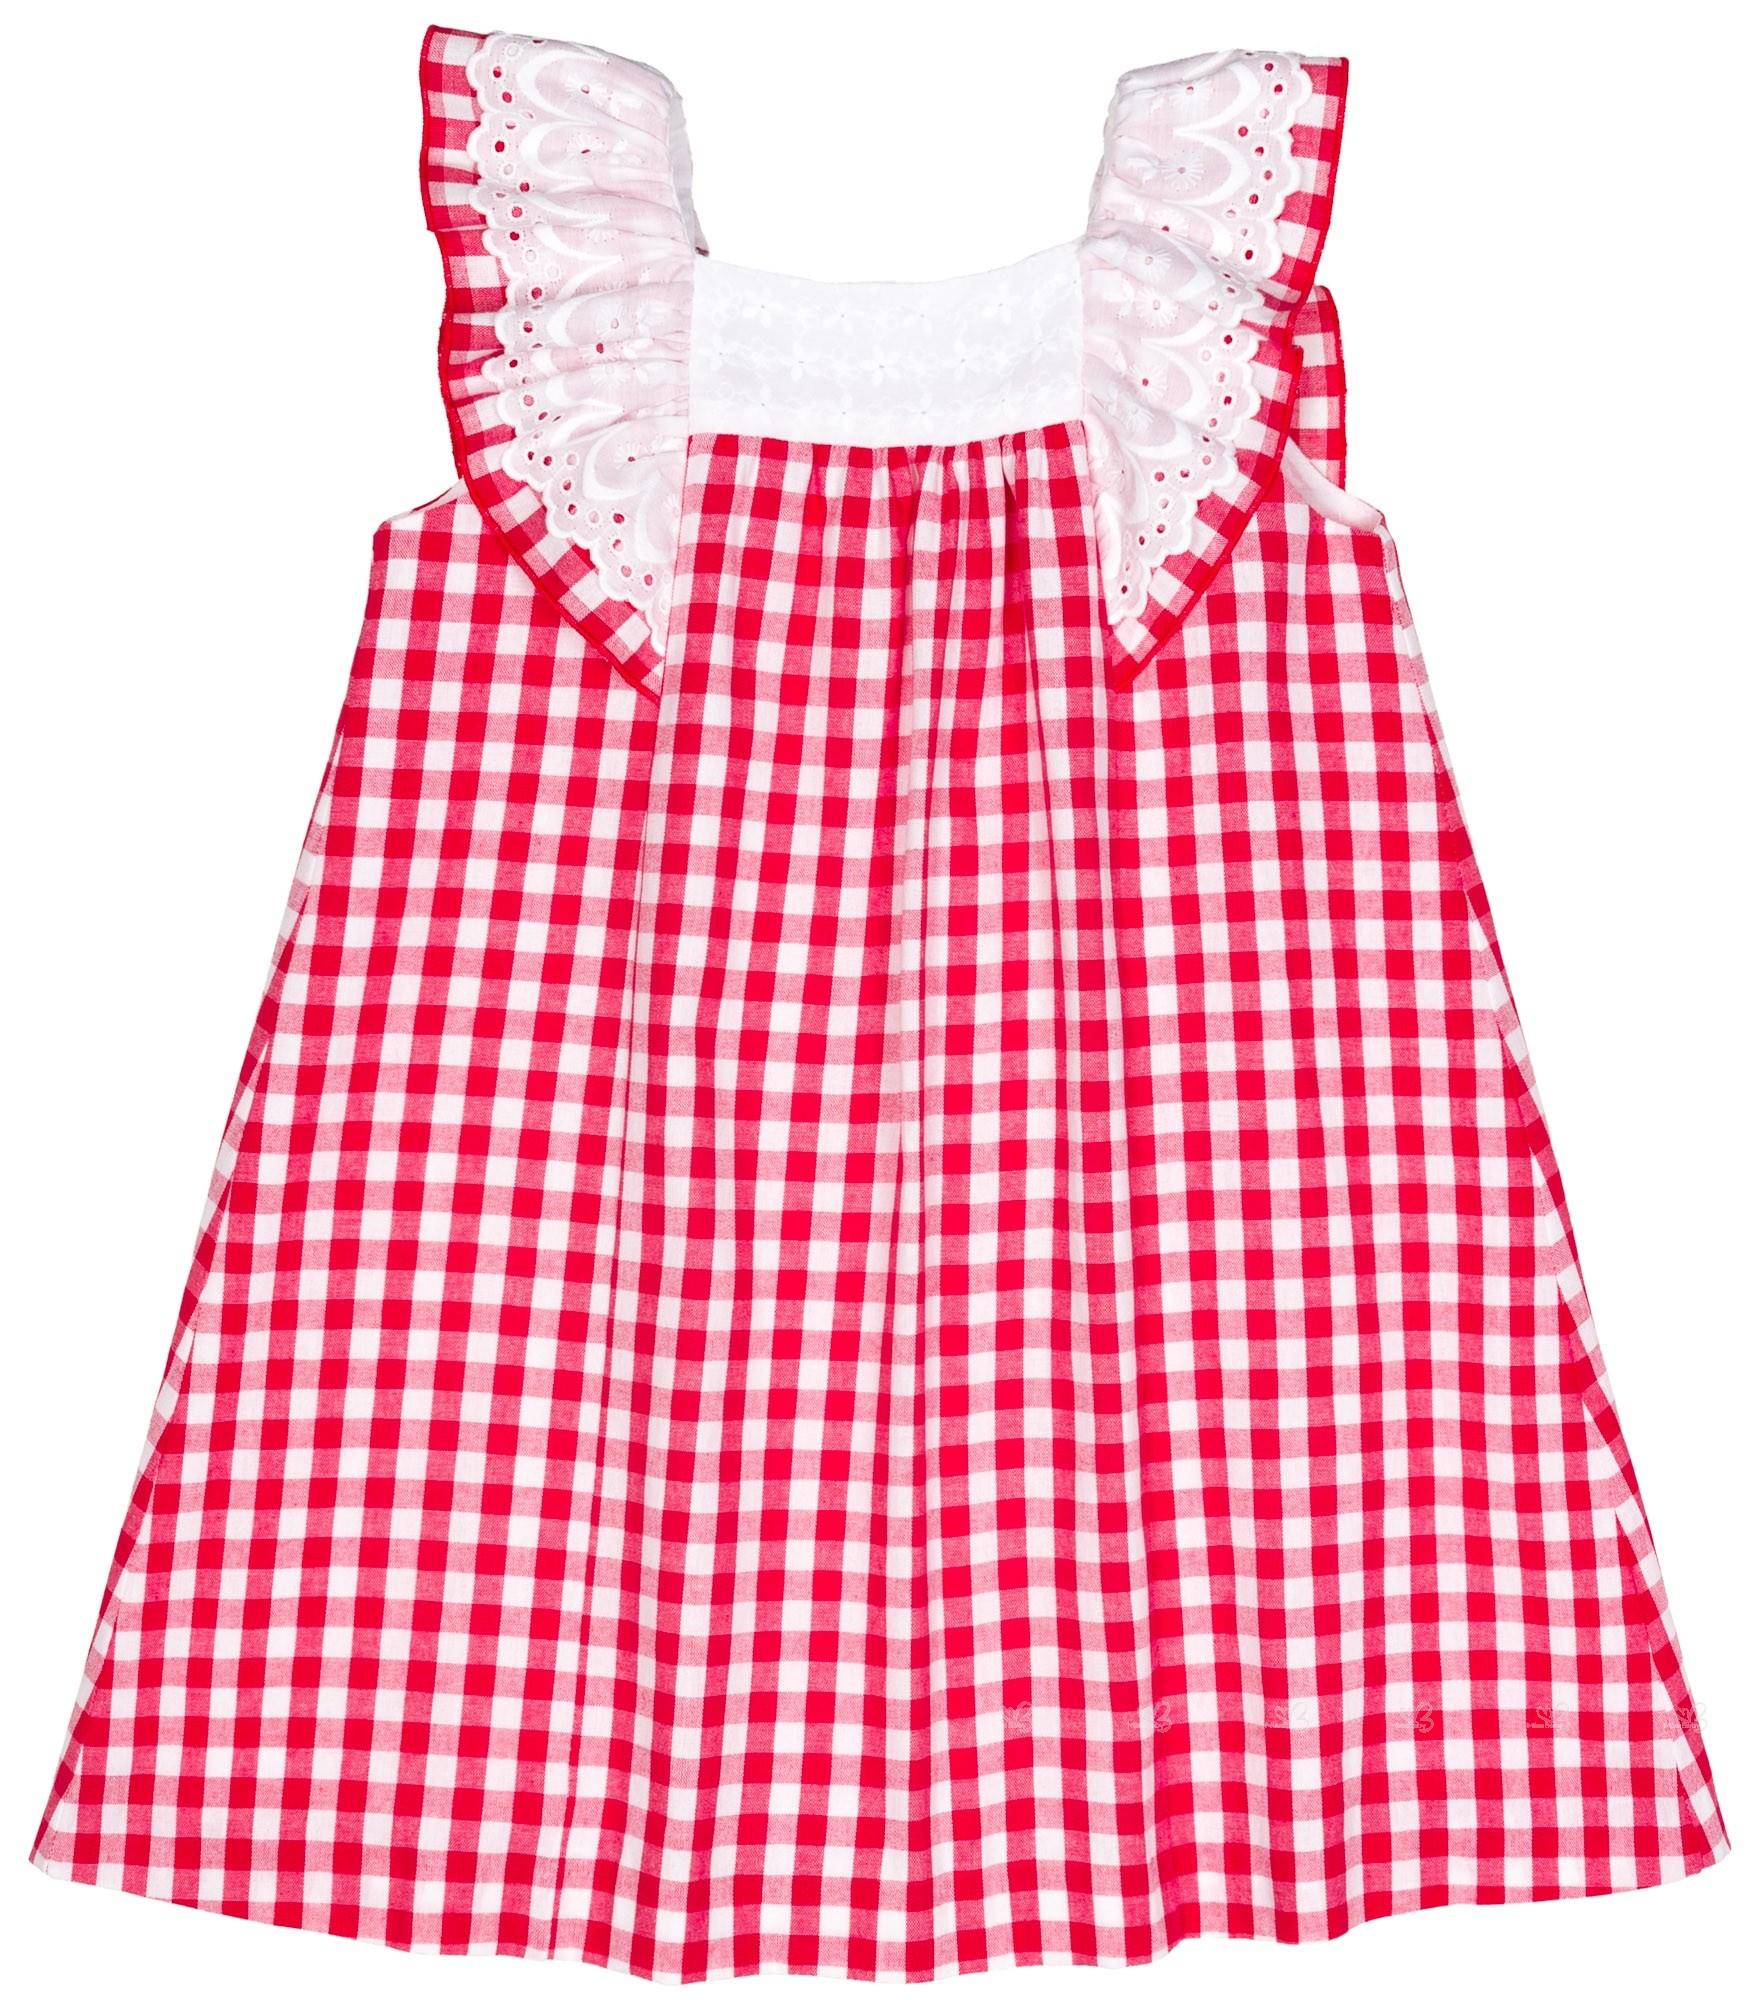 8a43142af Home; Girls Red & White Gingham dress with Navy Blue Bow. Mon Petit Bonbon  Vestido Niña Evasé Vichy Rojo Lazo Marino ...